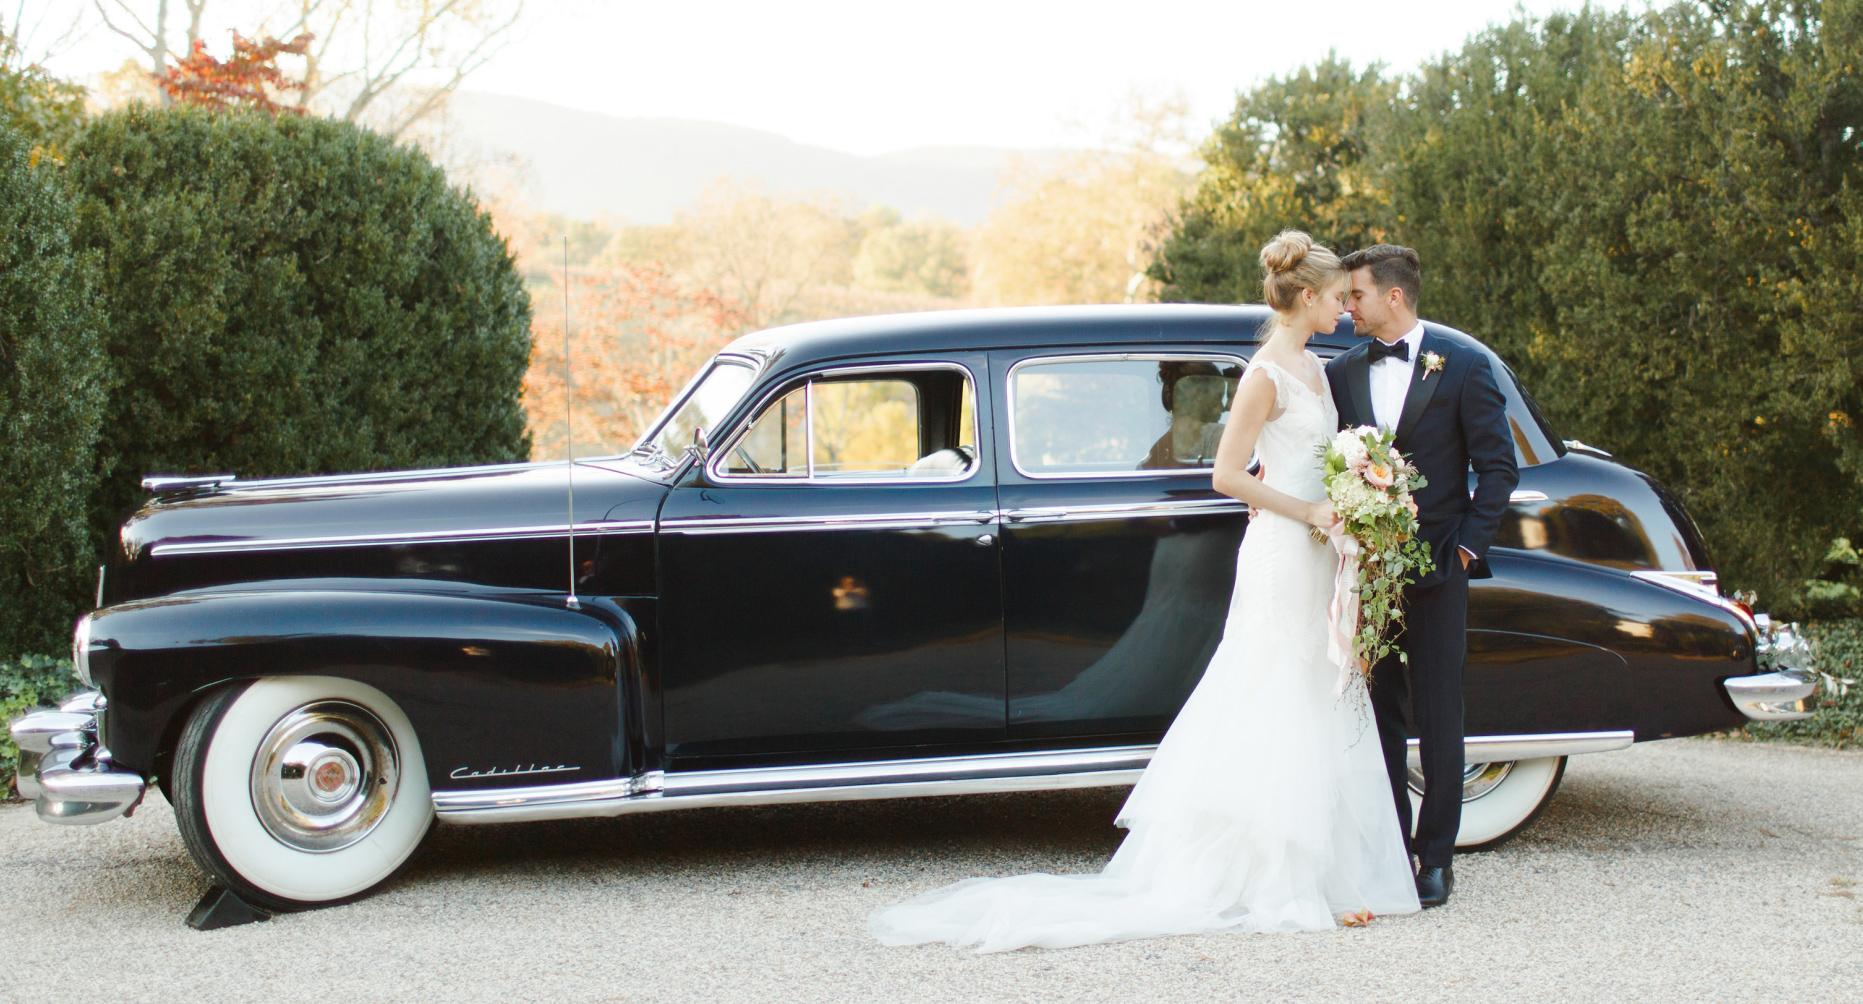 Best Charlottesville Wedding Transportation, Wedding Buses, Best of Cville 2019